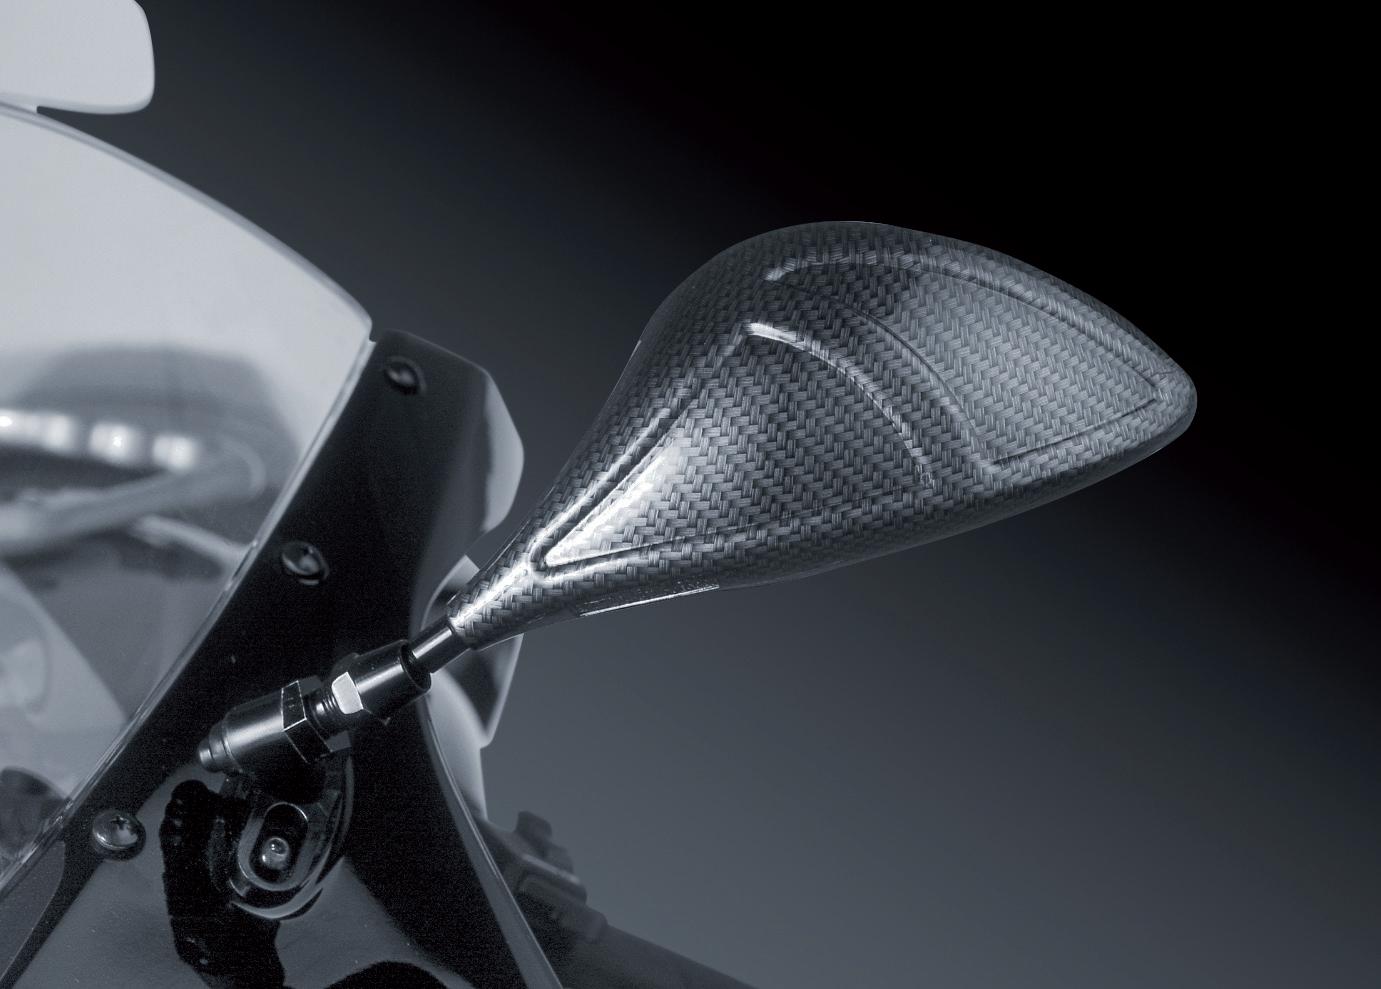 Espejo retrovisor derecho universal rosca m10 puig 4306 for Espejo retrovisor derecho